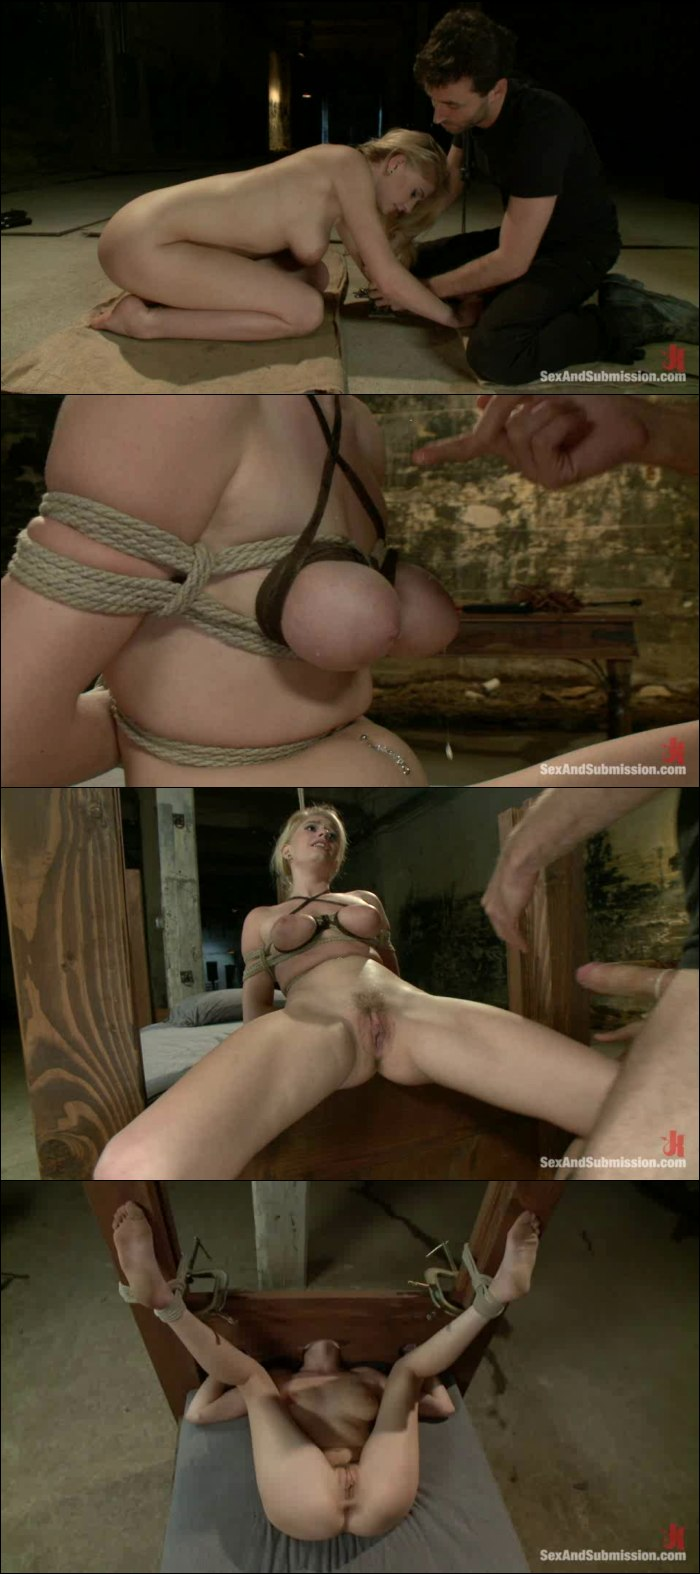 Allie James Femdom Porn hardcore related girls - bondage girls - page 323 - jdforum